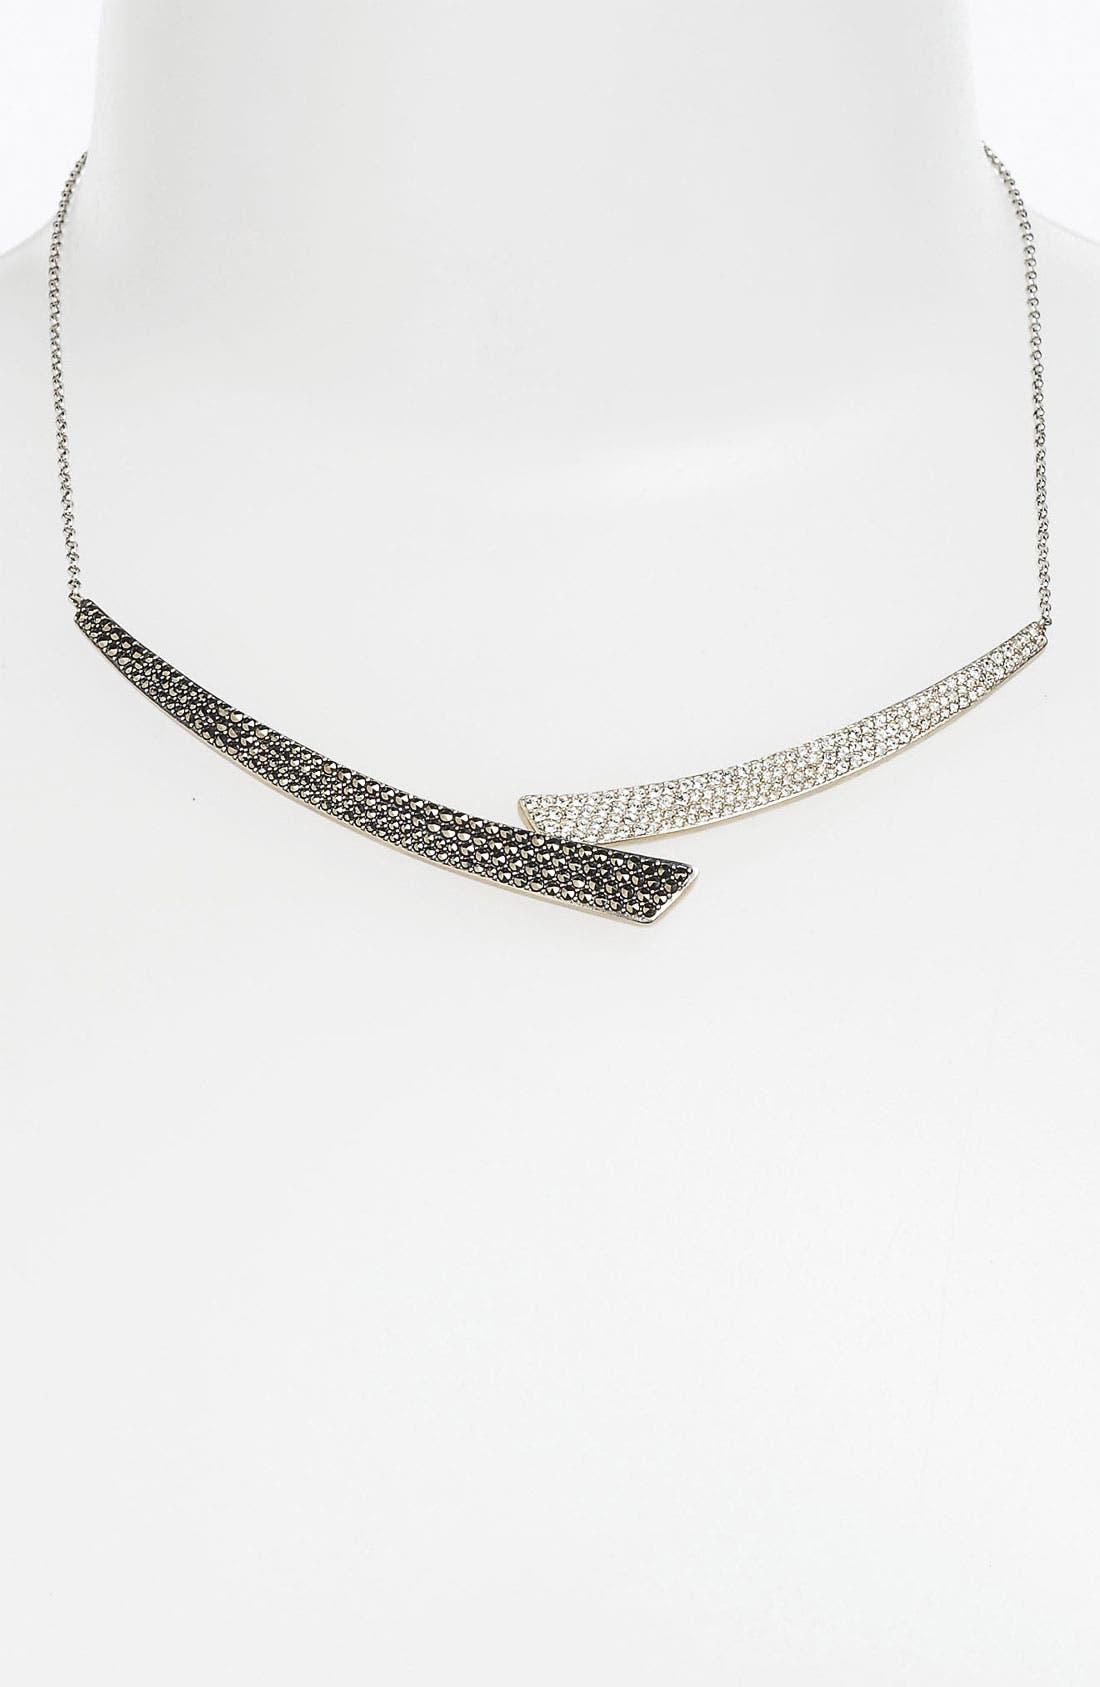 Alternate Image 1 Selected - Judith Jack 'Crystal Glitz' Collar Necklace